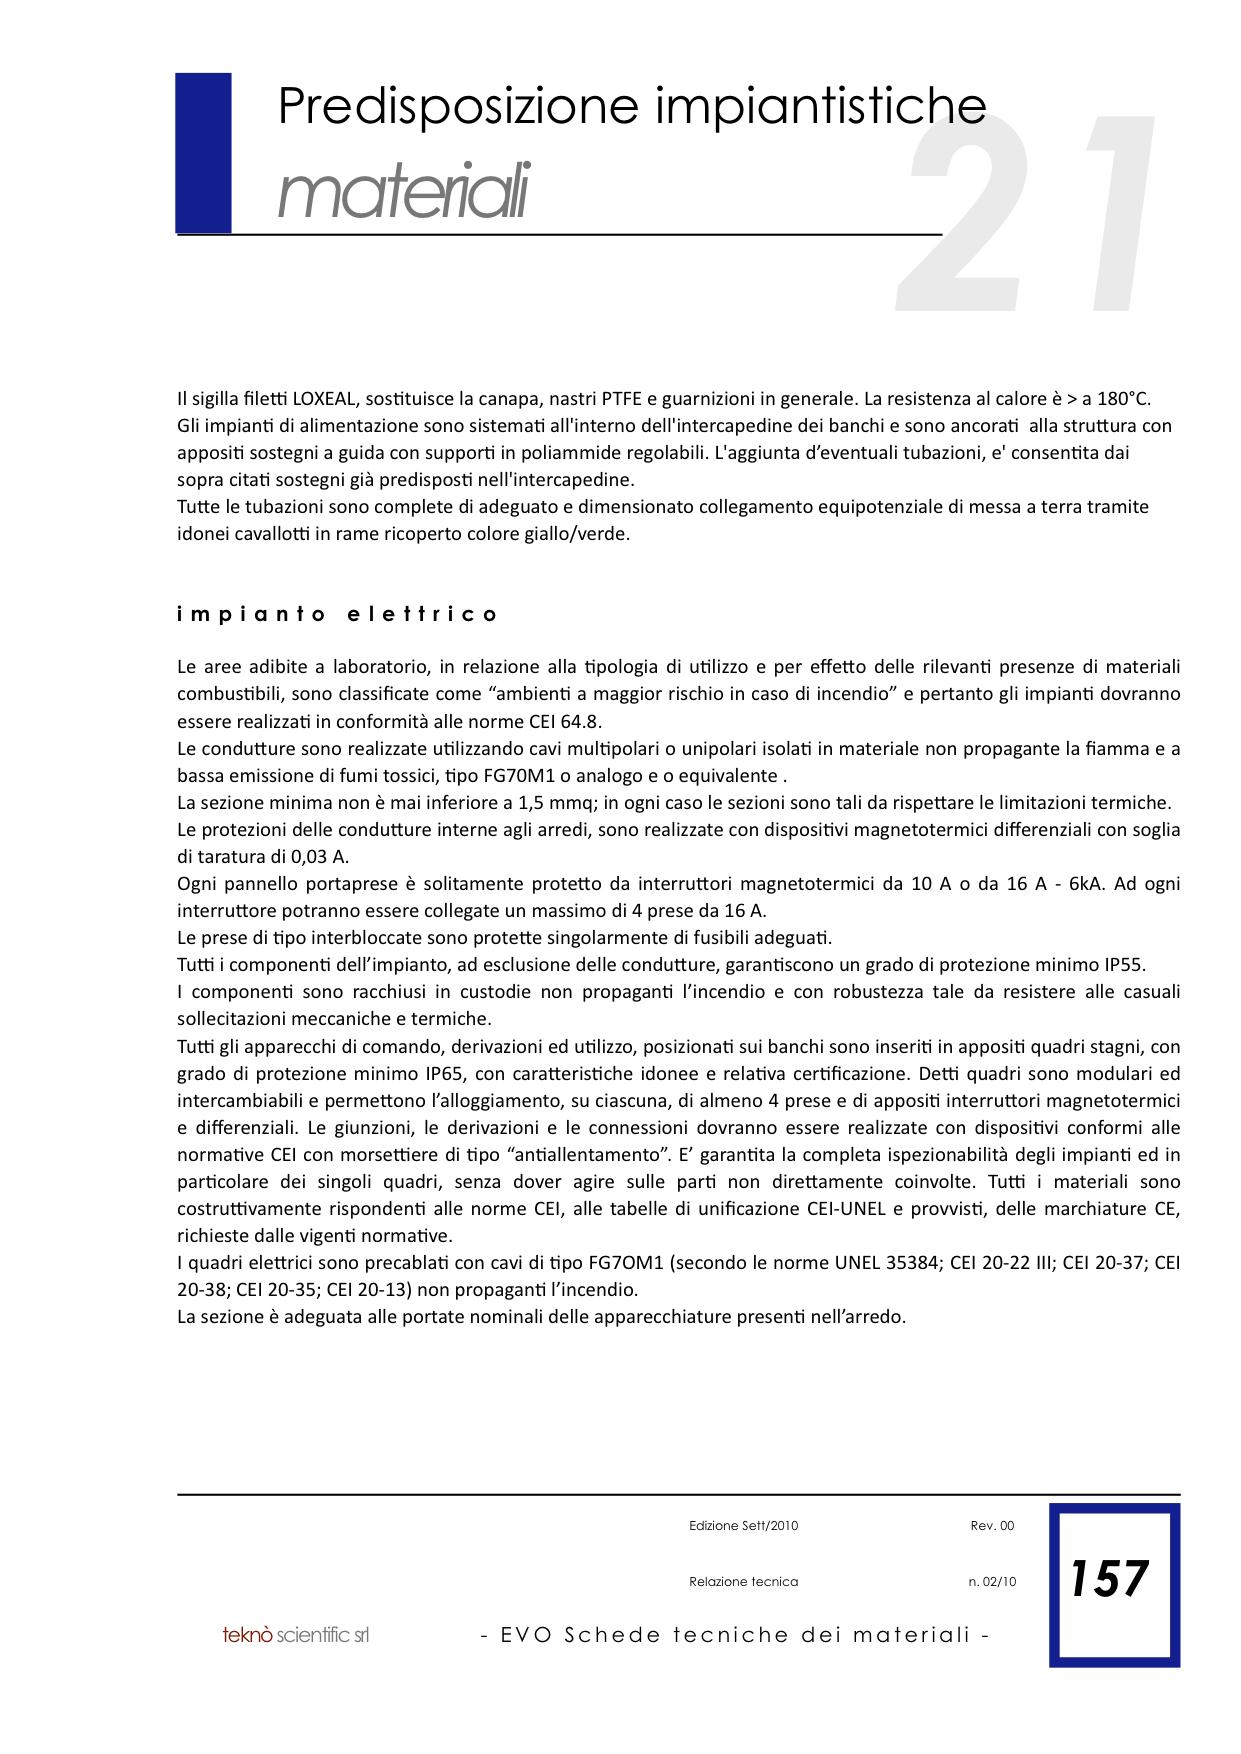 EVO Schede Tecniche materiali copia 17.png